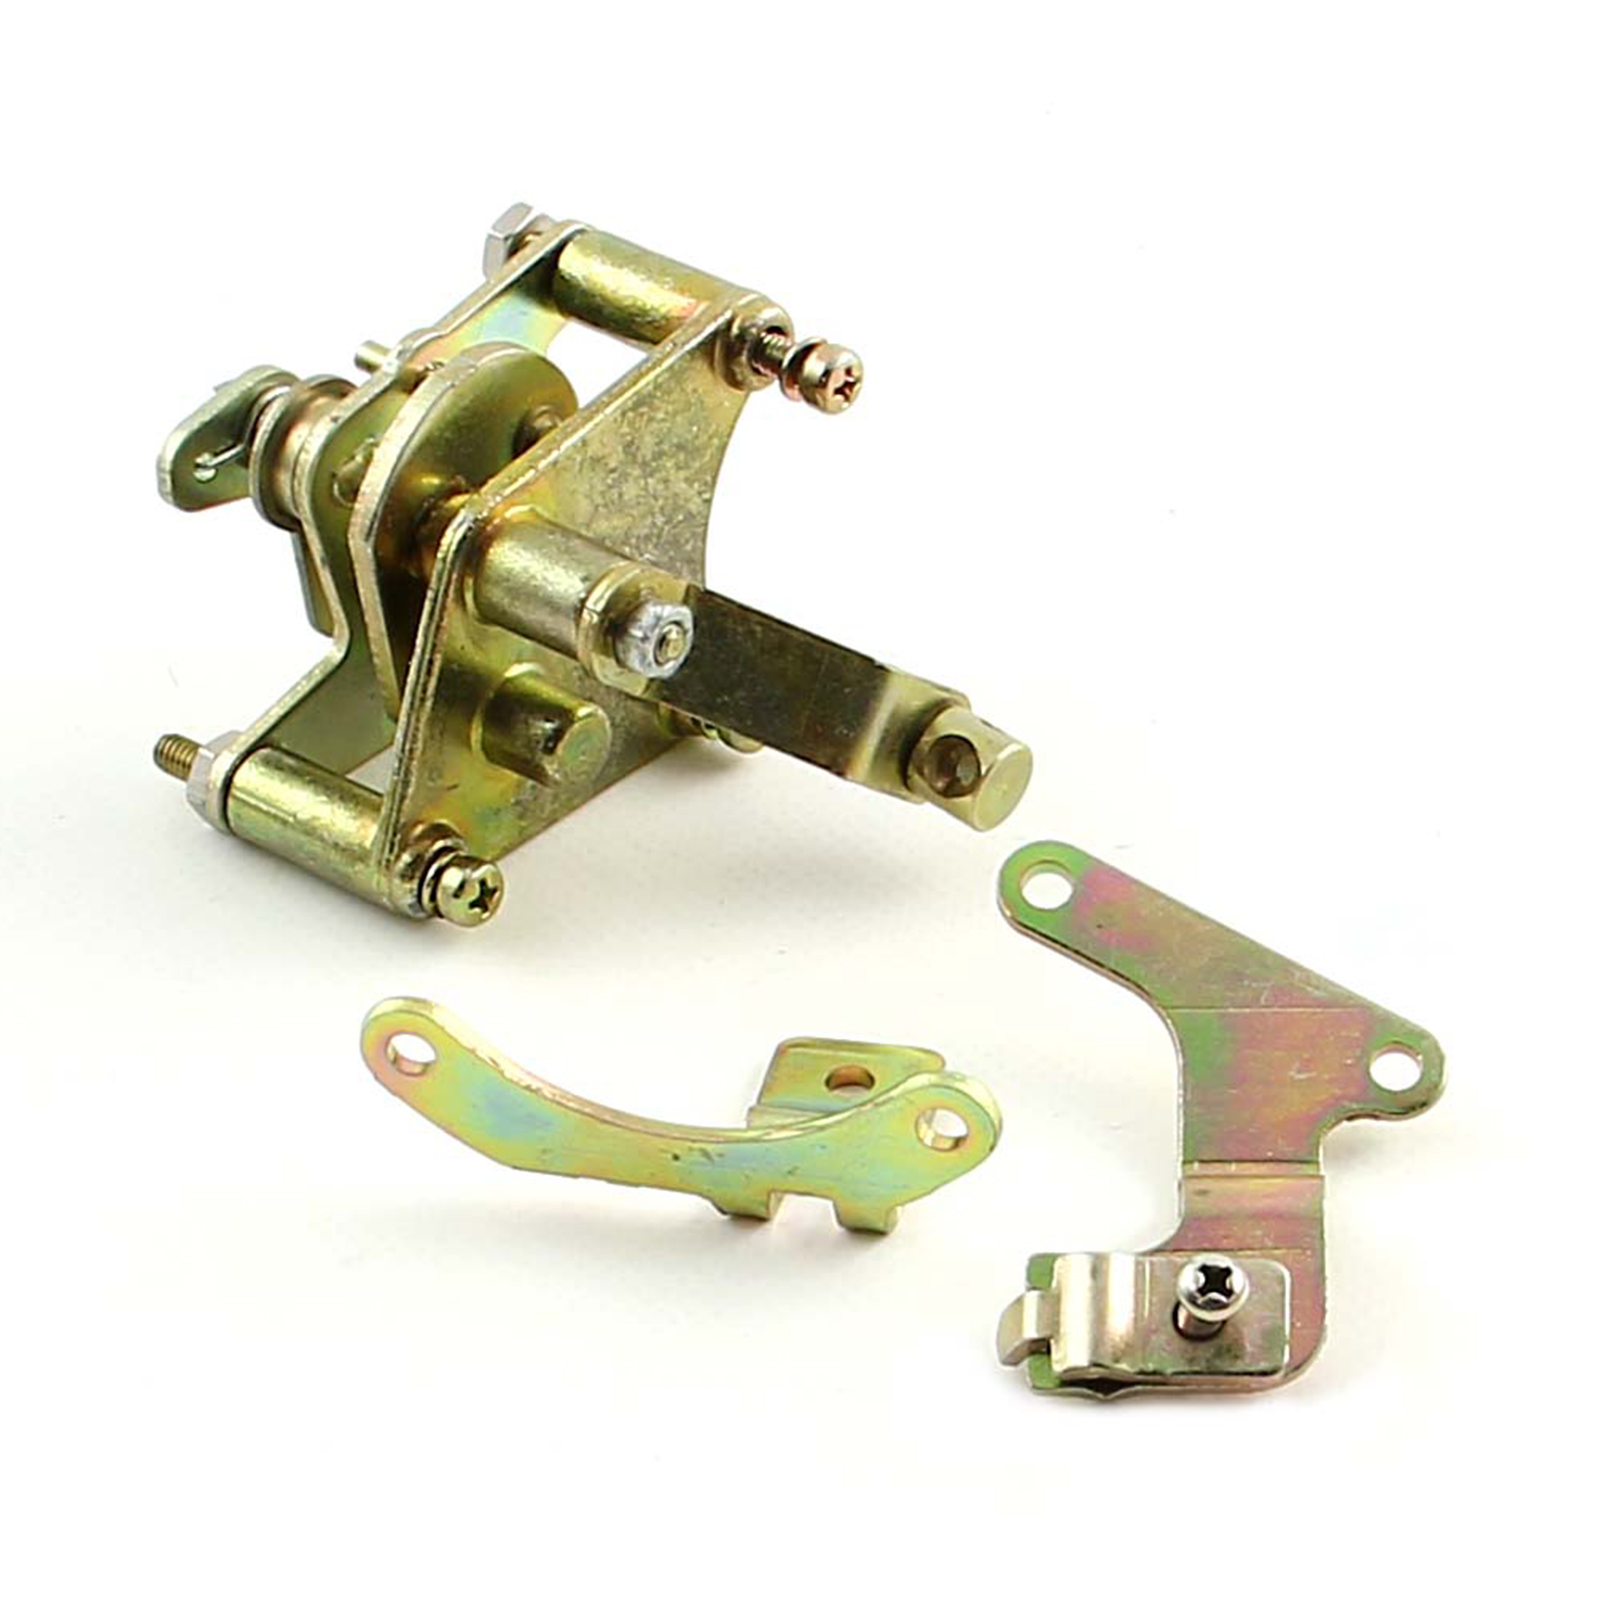 Carburetor Manual Choke Kit (Suits Double Pumper Body)